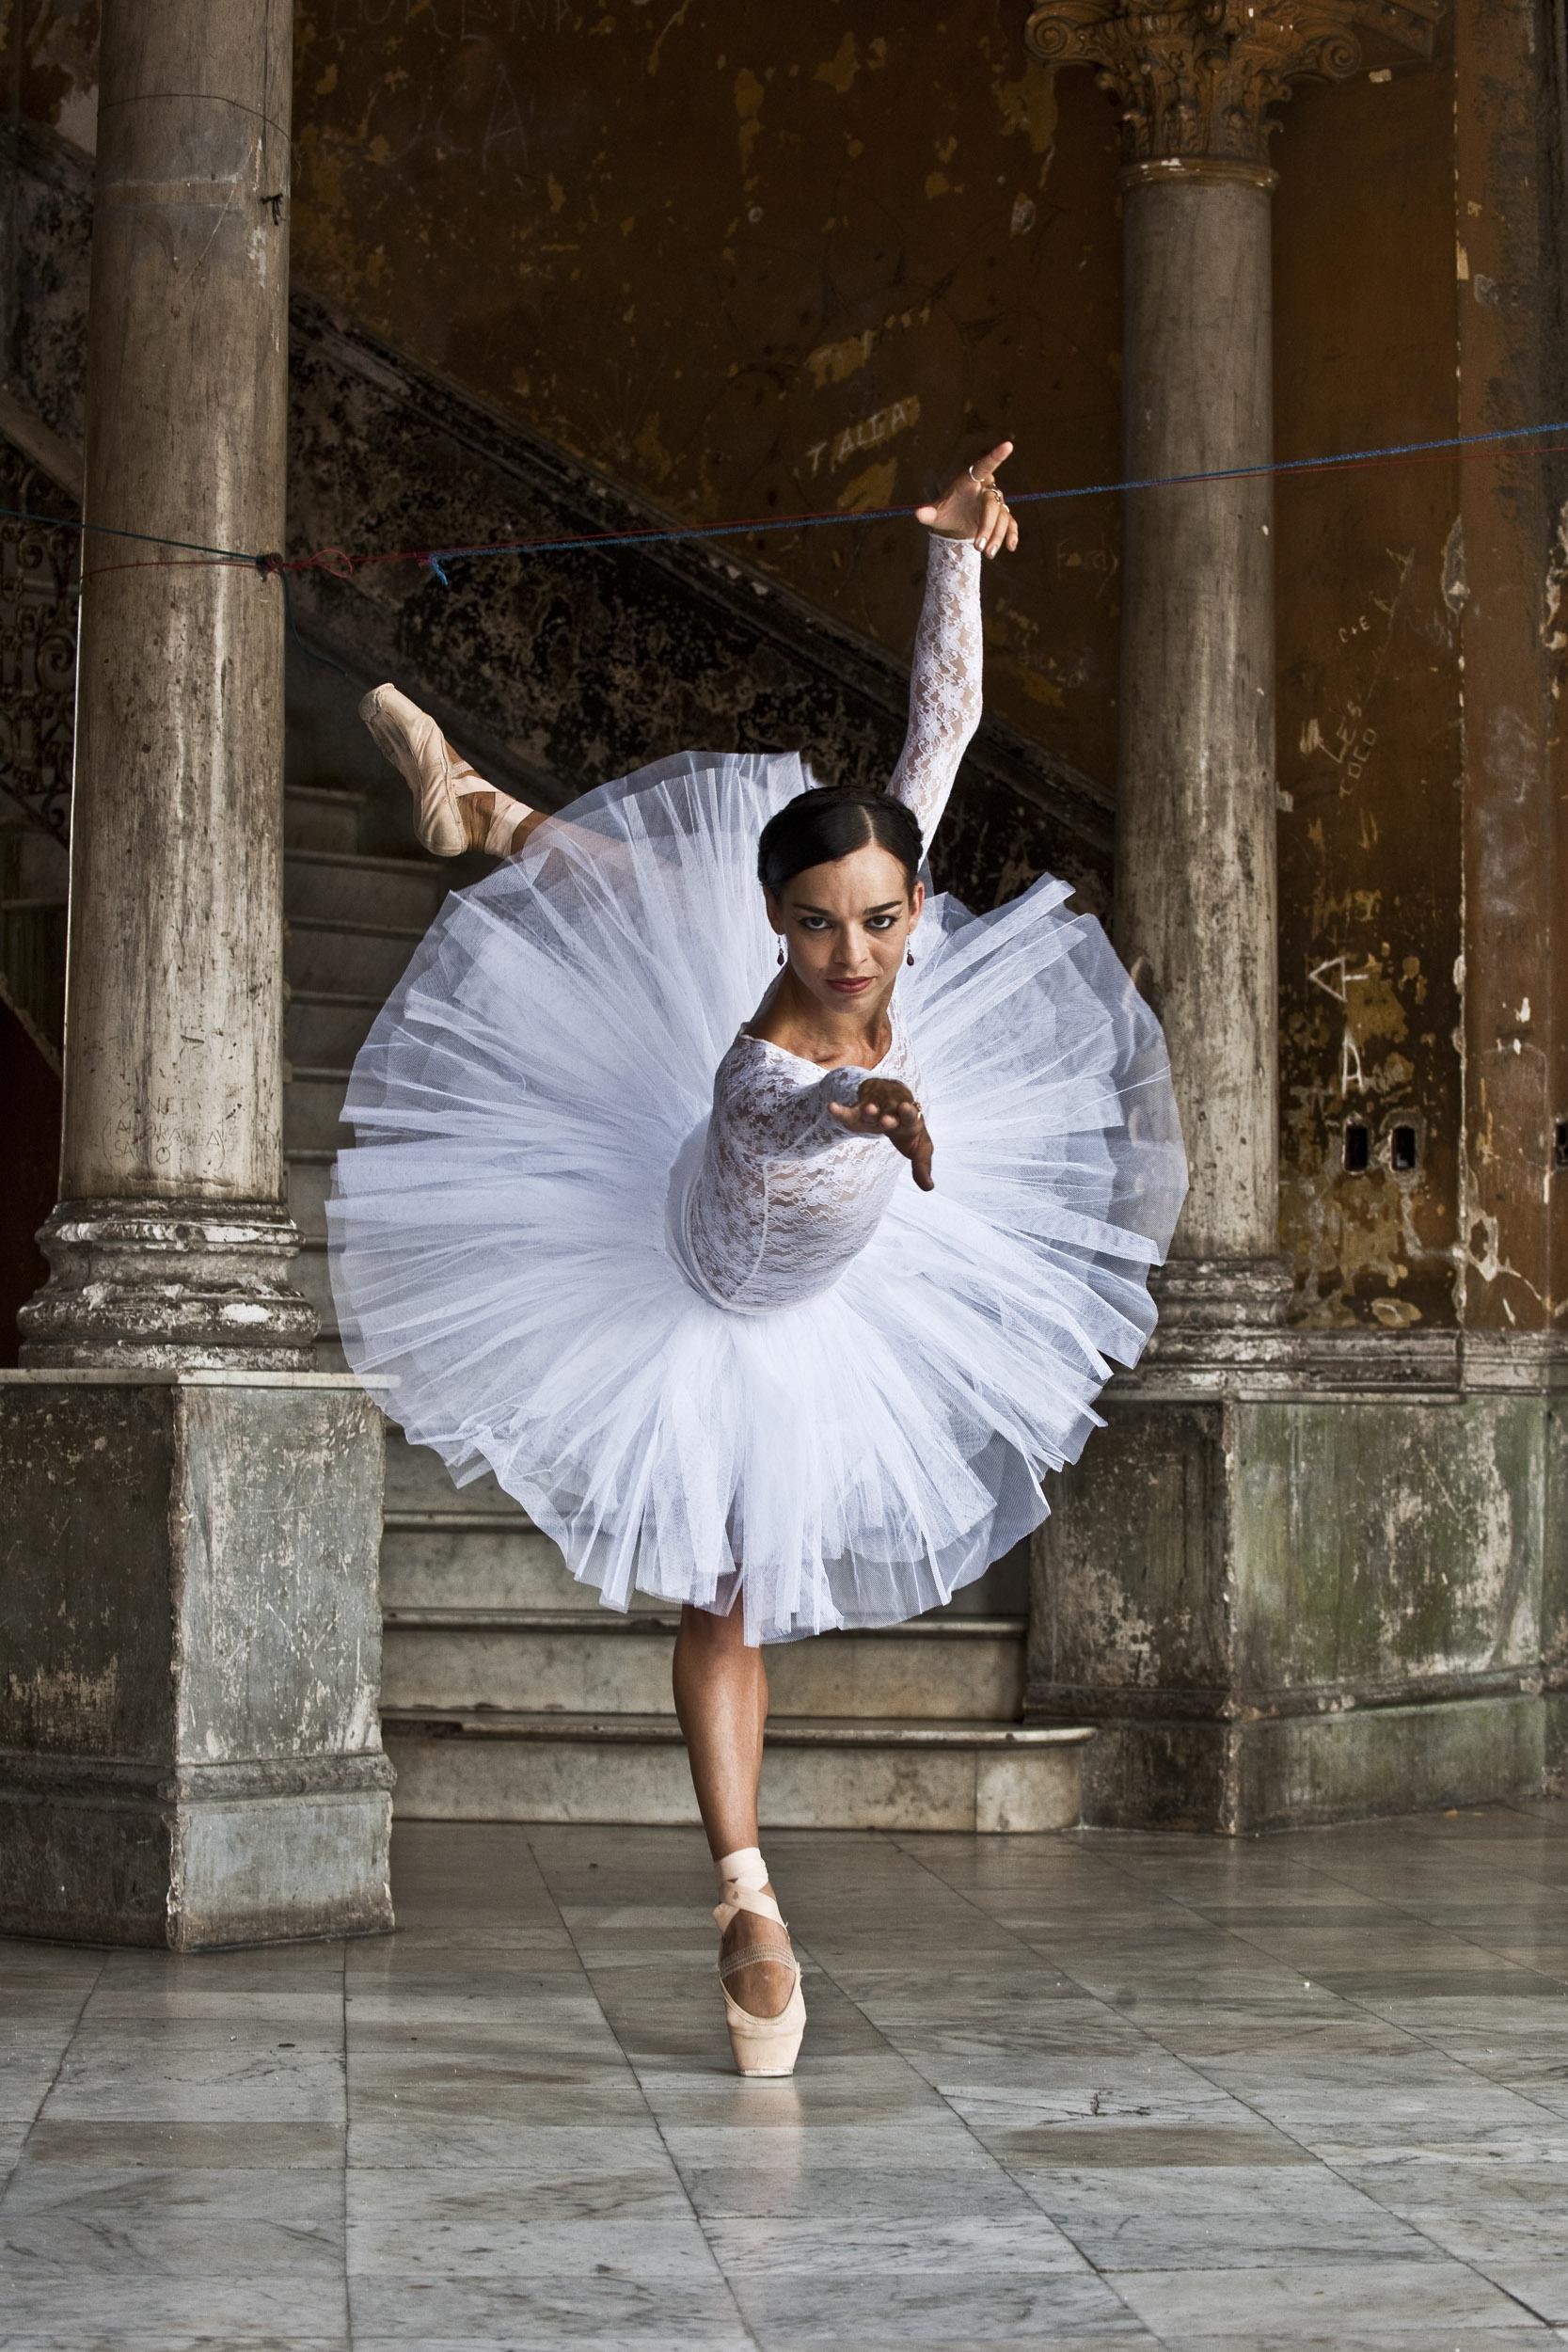 Viengsay Valdés, dancer - Illuminated Cuba - Hector Garrido, Aerial and human photography